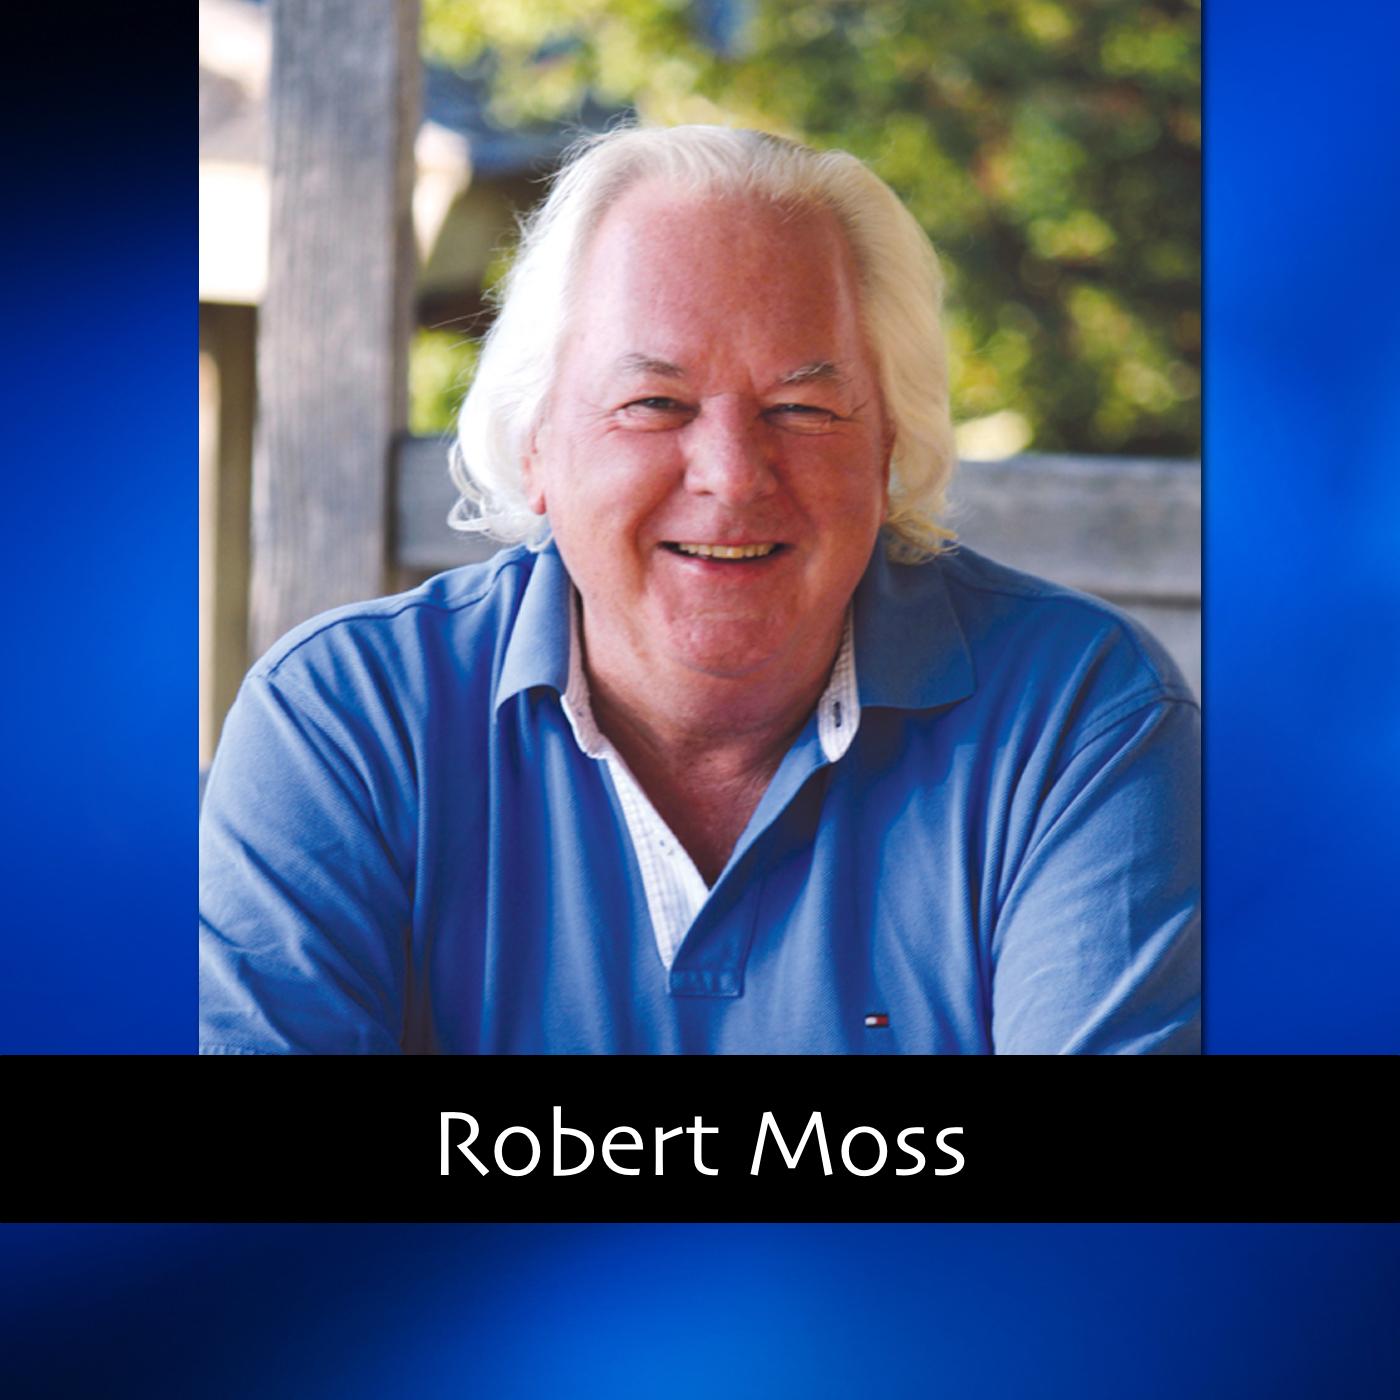 Robert Moss thumb.jpg